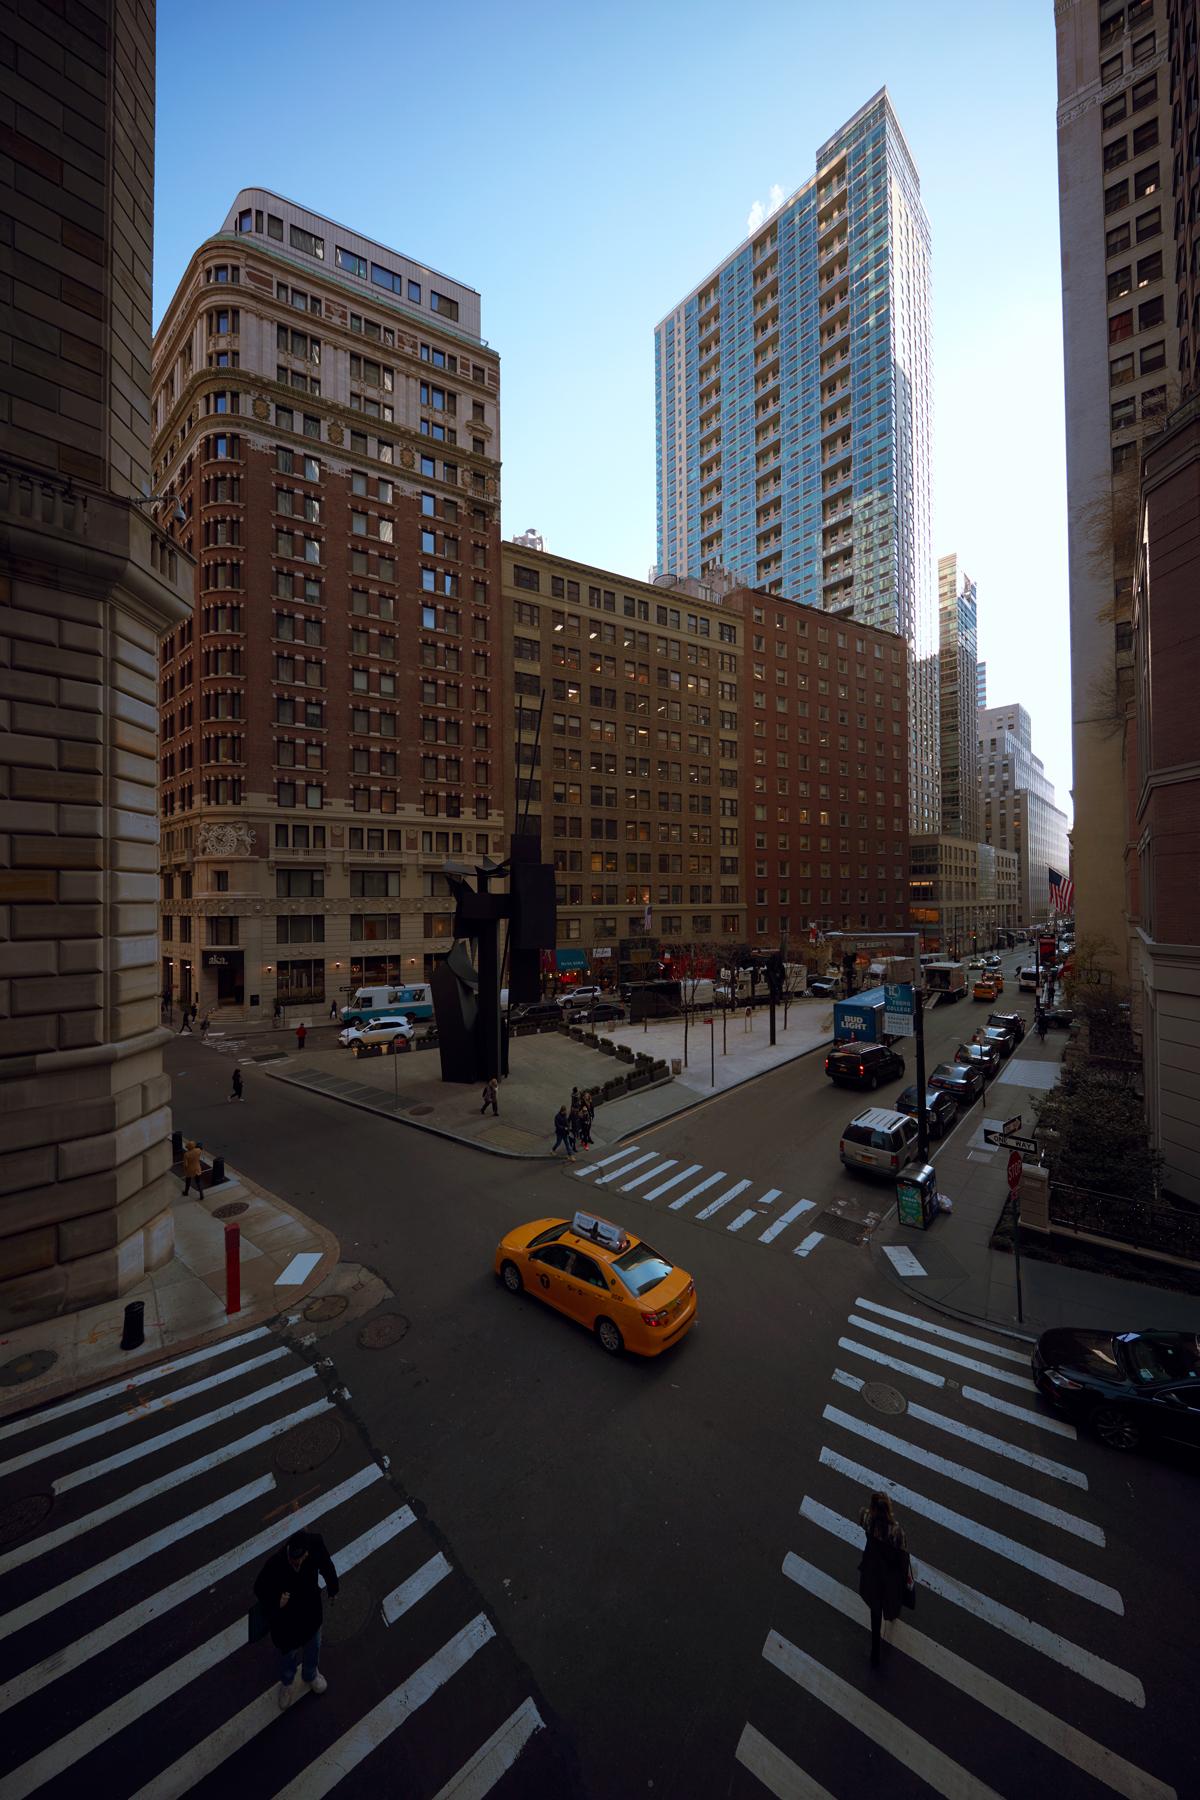 161214_NYC_014.jpg